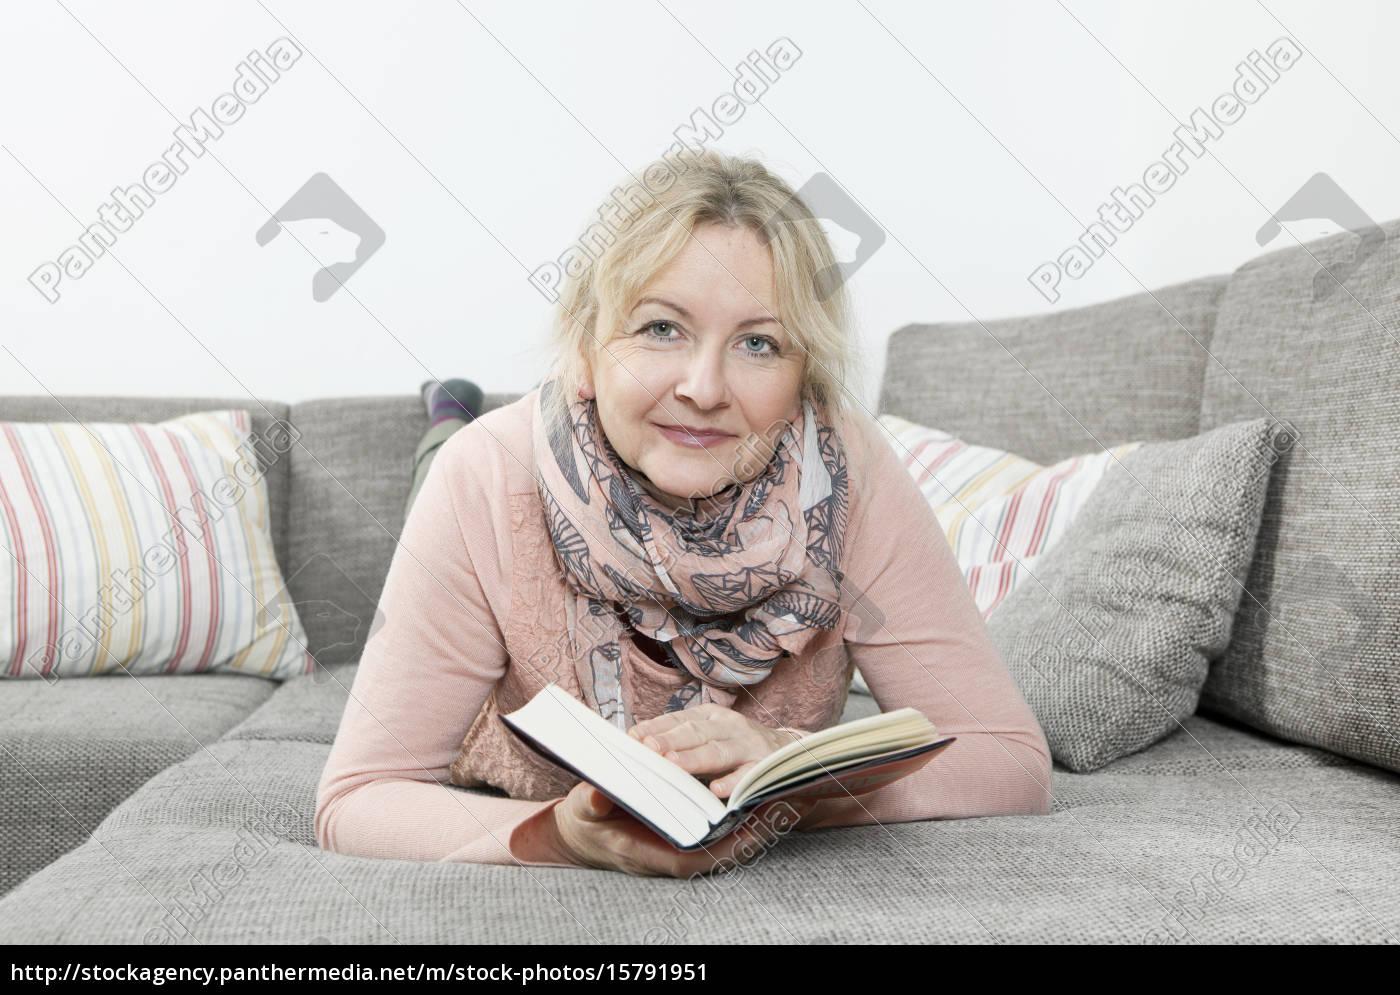 woman, reading, book, on, sofa - 15791951